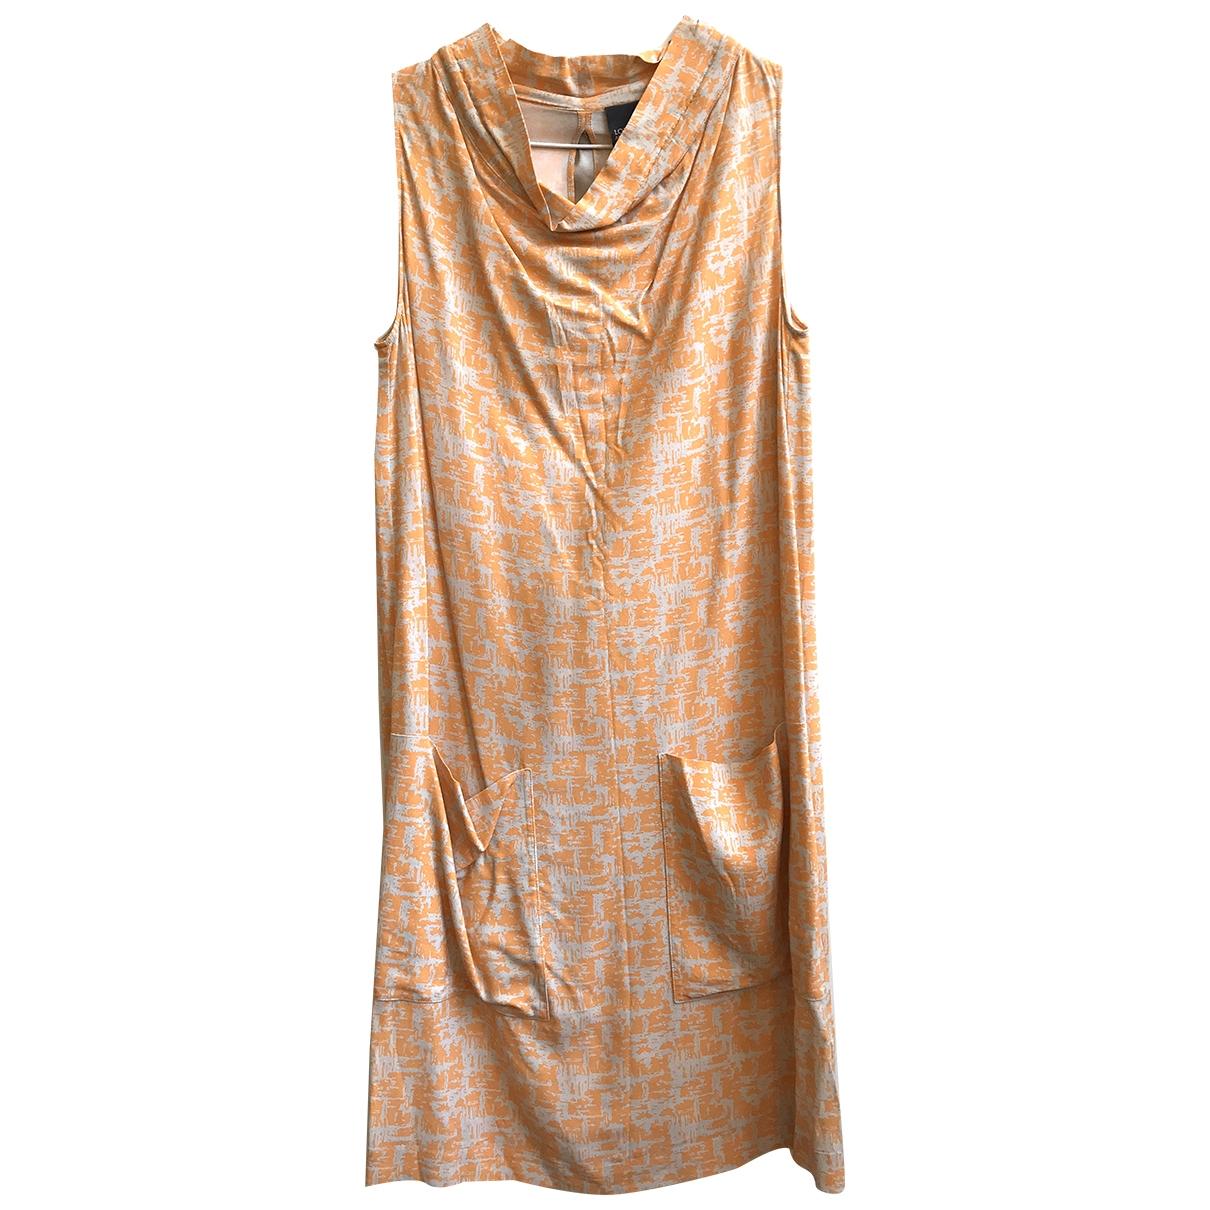 Lorena Antoniazzi \N Orange dress for Women 40 IT